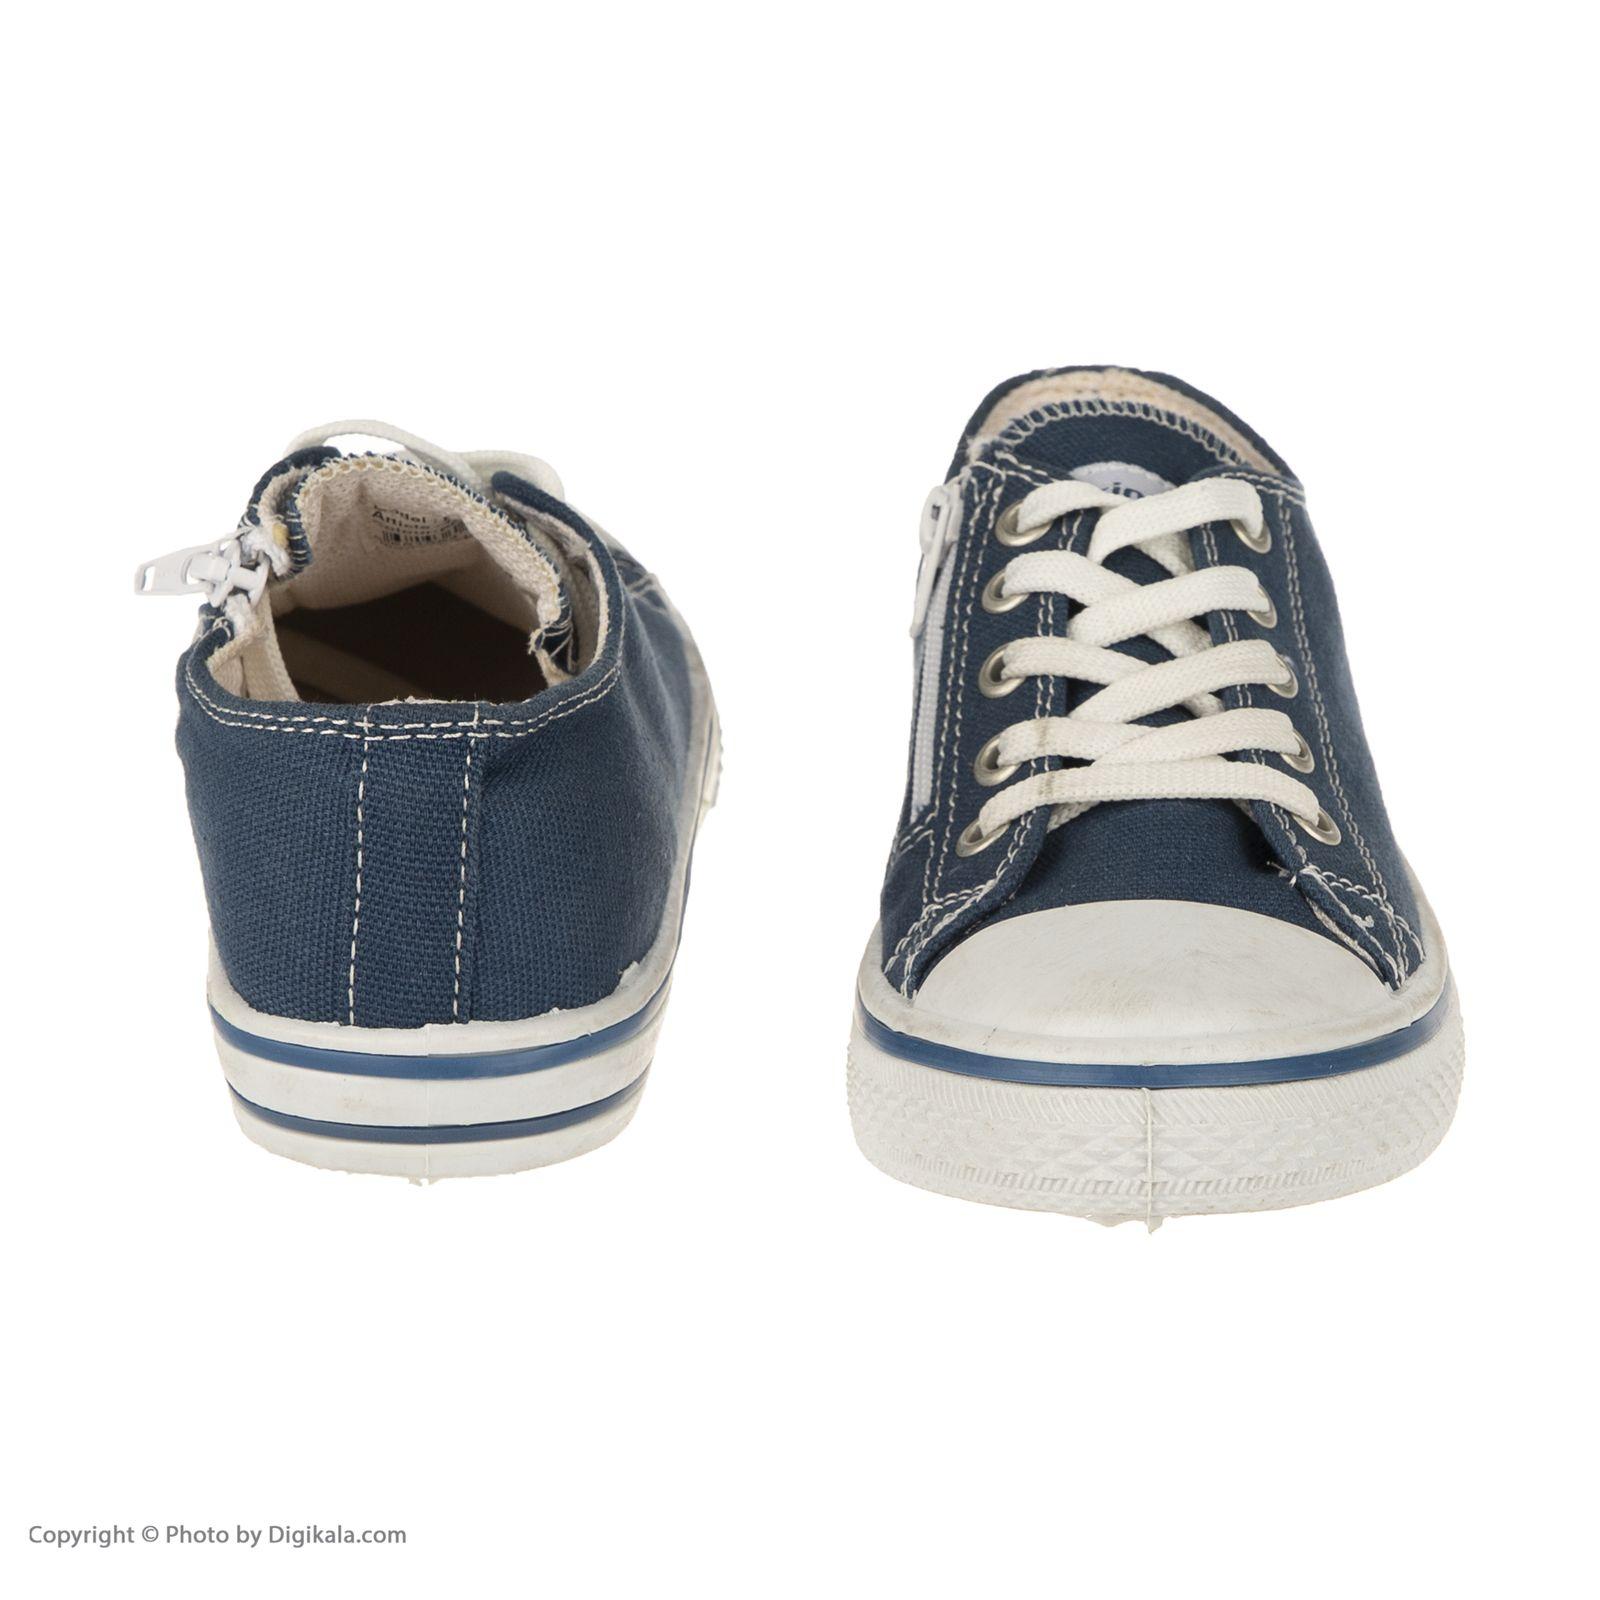 کفش پسرانه کینتیکس مدل 100232926-PETROL